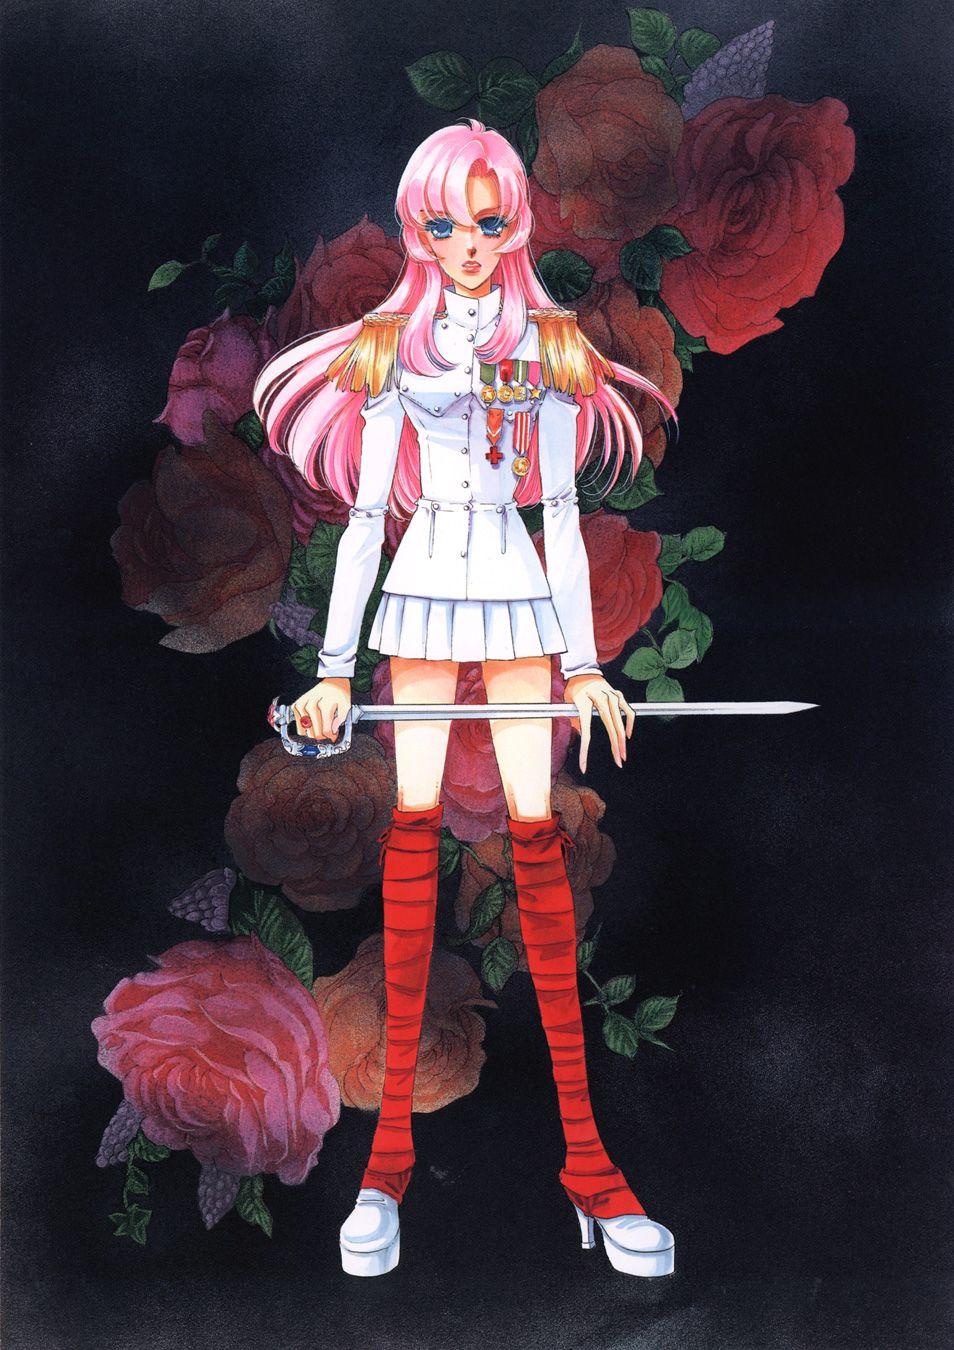 Duelist Love The Red And White Contrast Utena Revolutionary Girl Utena Manga Illustration